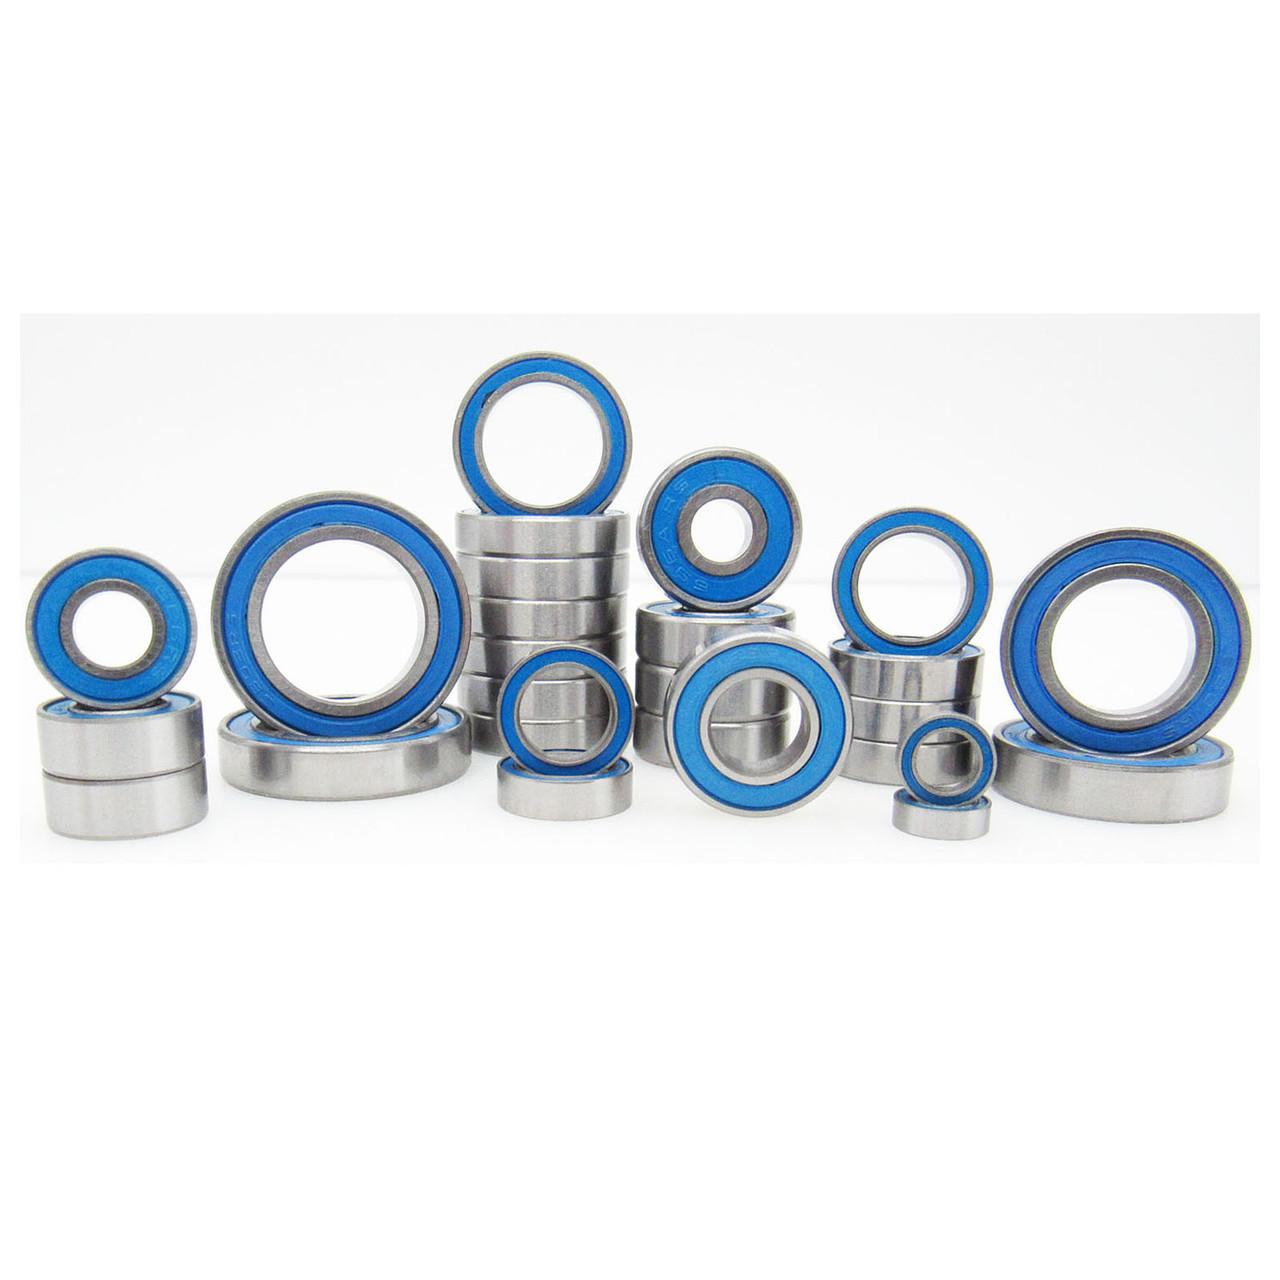 TRB RC Ball Bearing Kit (27) Rubber Seals Blue Traxxas MAXX 4S